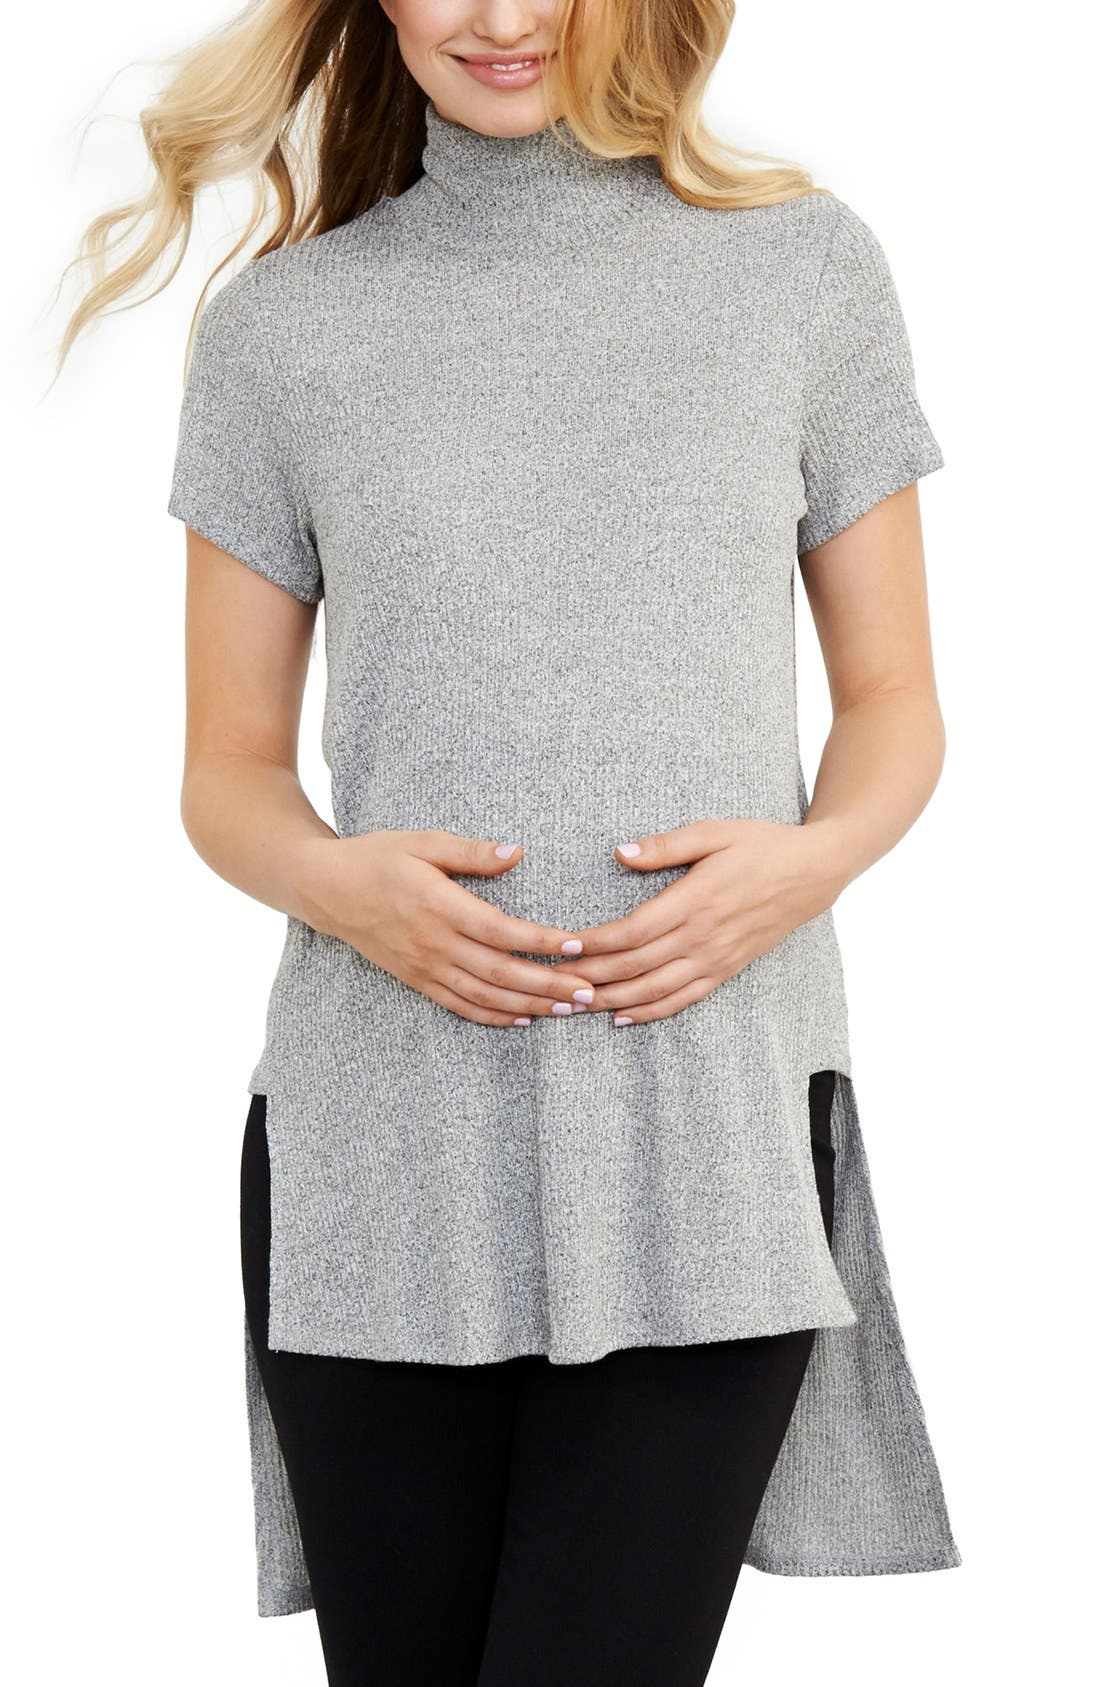 MATERNAL AMERICA,                             Turtleneck High/Low Maternity Top,                             Main thumbnail 1, color,                             020